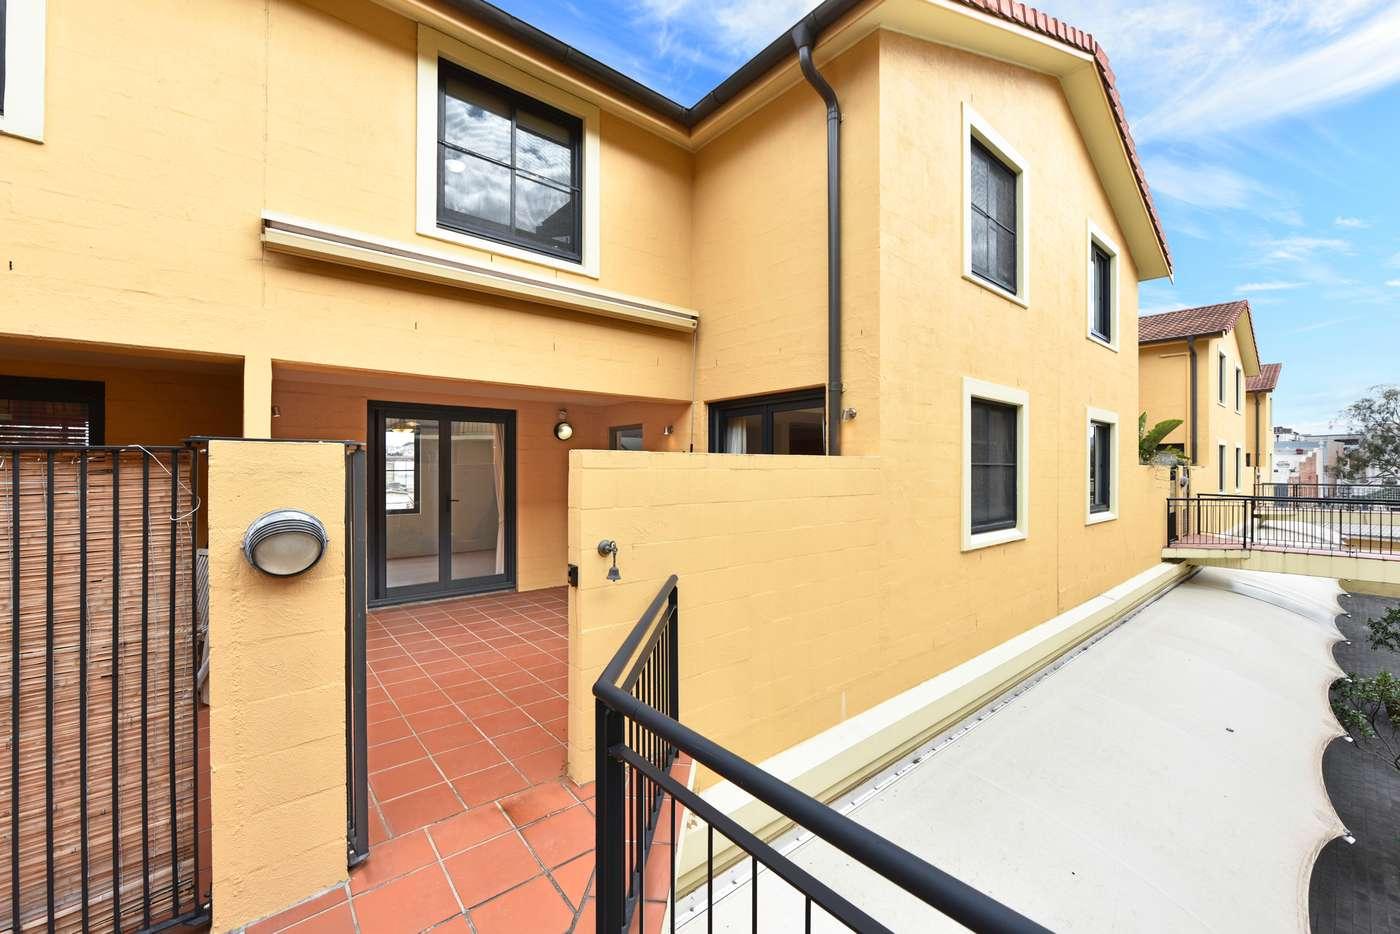 Main view of Homely apartment listing, 32/21-23 Norton Street, Leichhardt NSW 2040